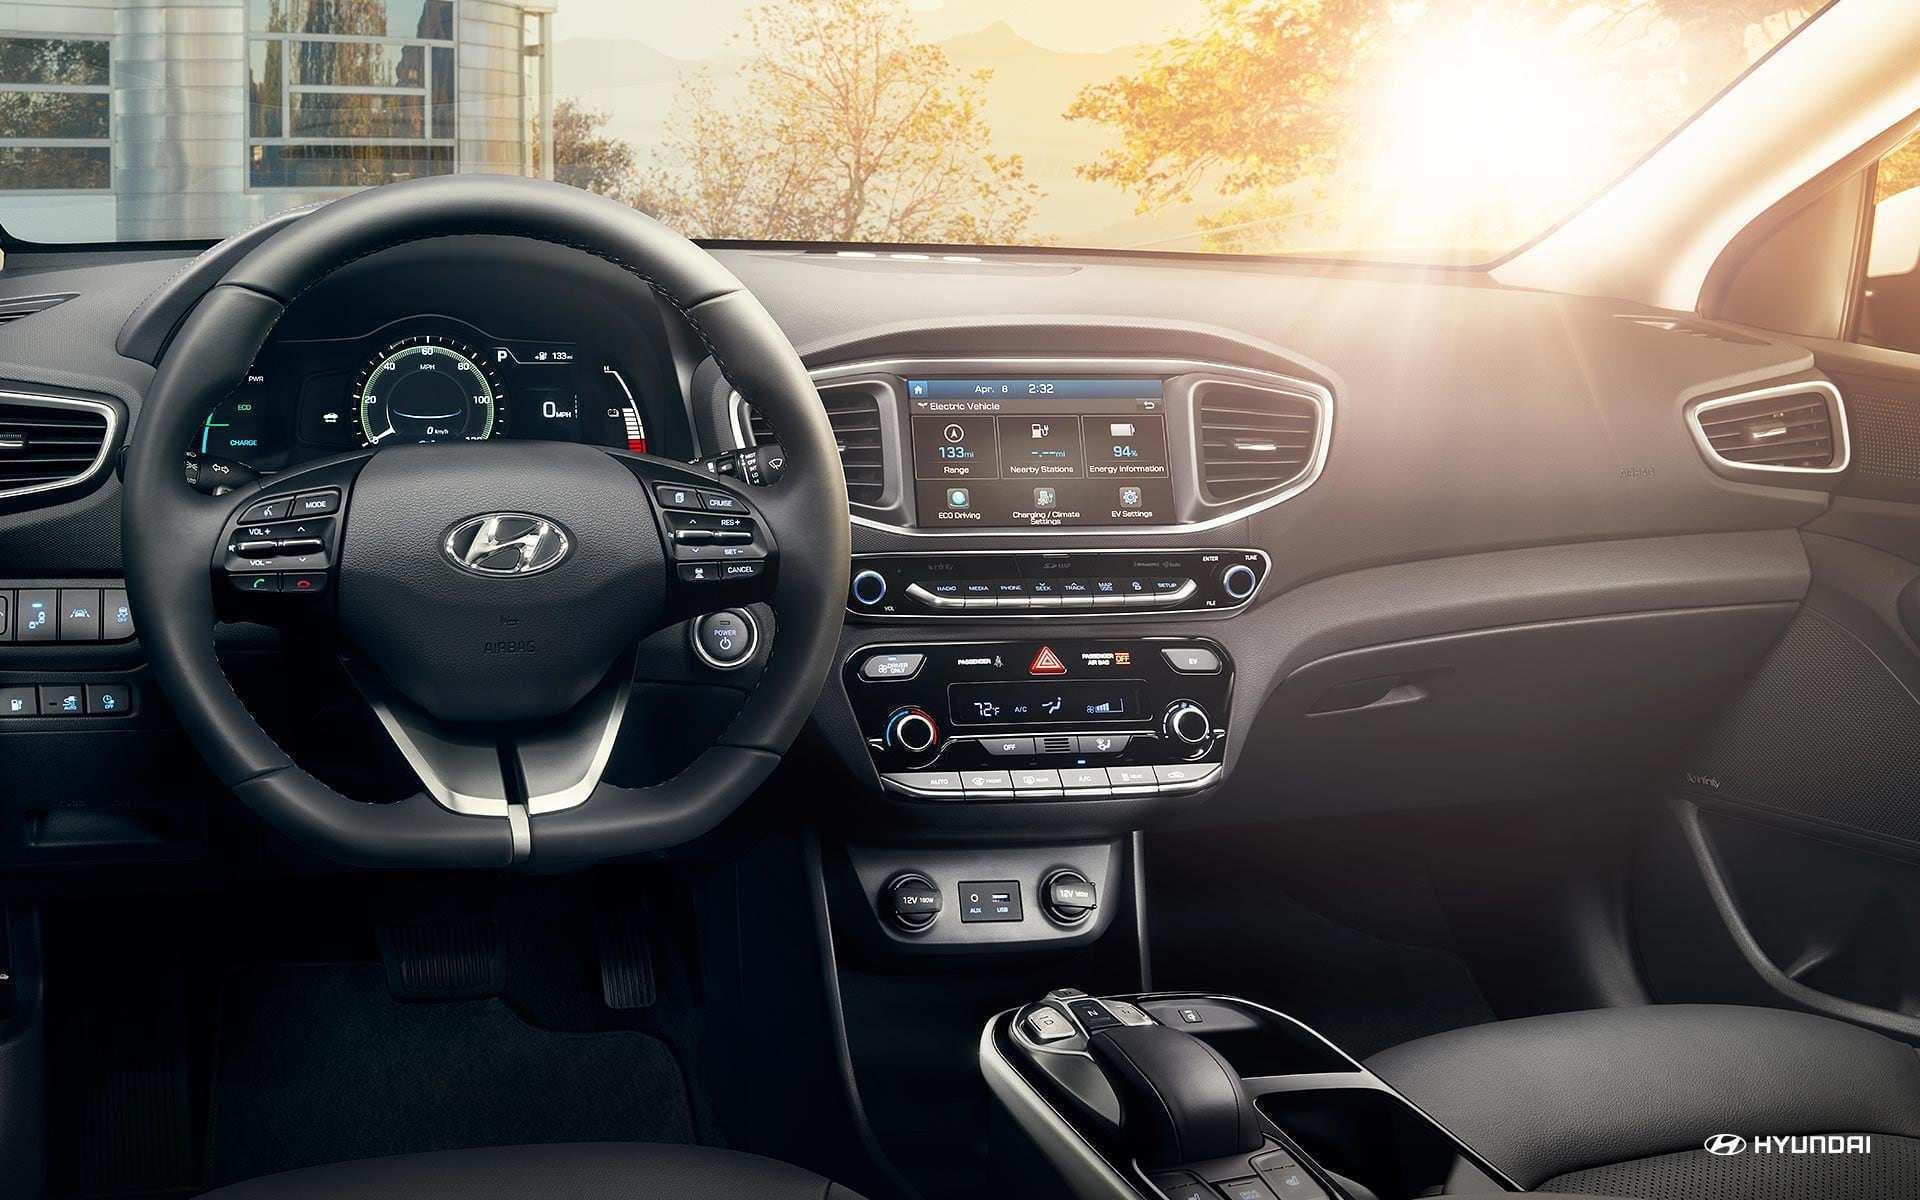 22 New 2019 Hyundai Ioniq Electric Speed Test by 2019 Hyundai Ioniq Electric